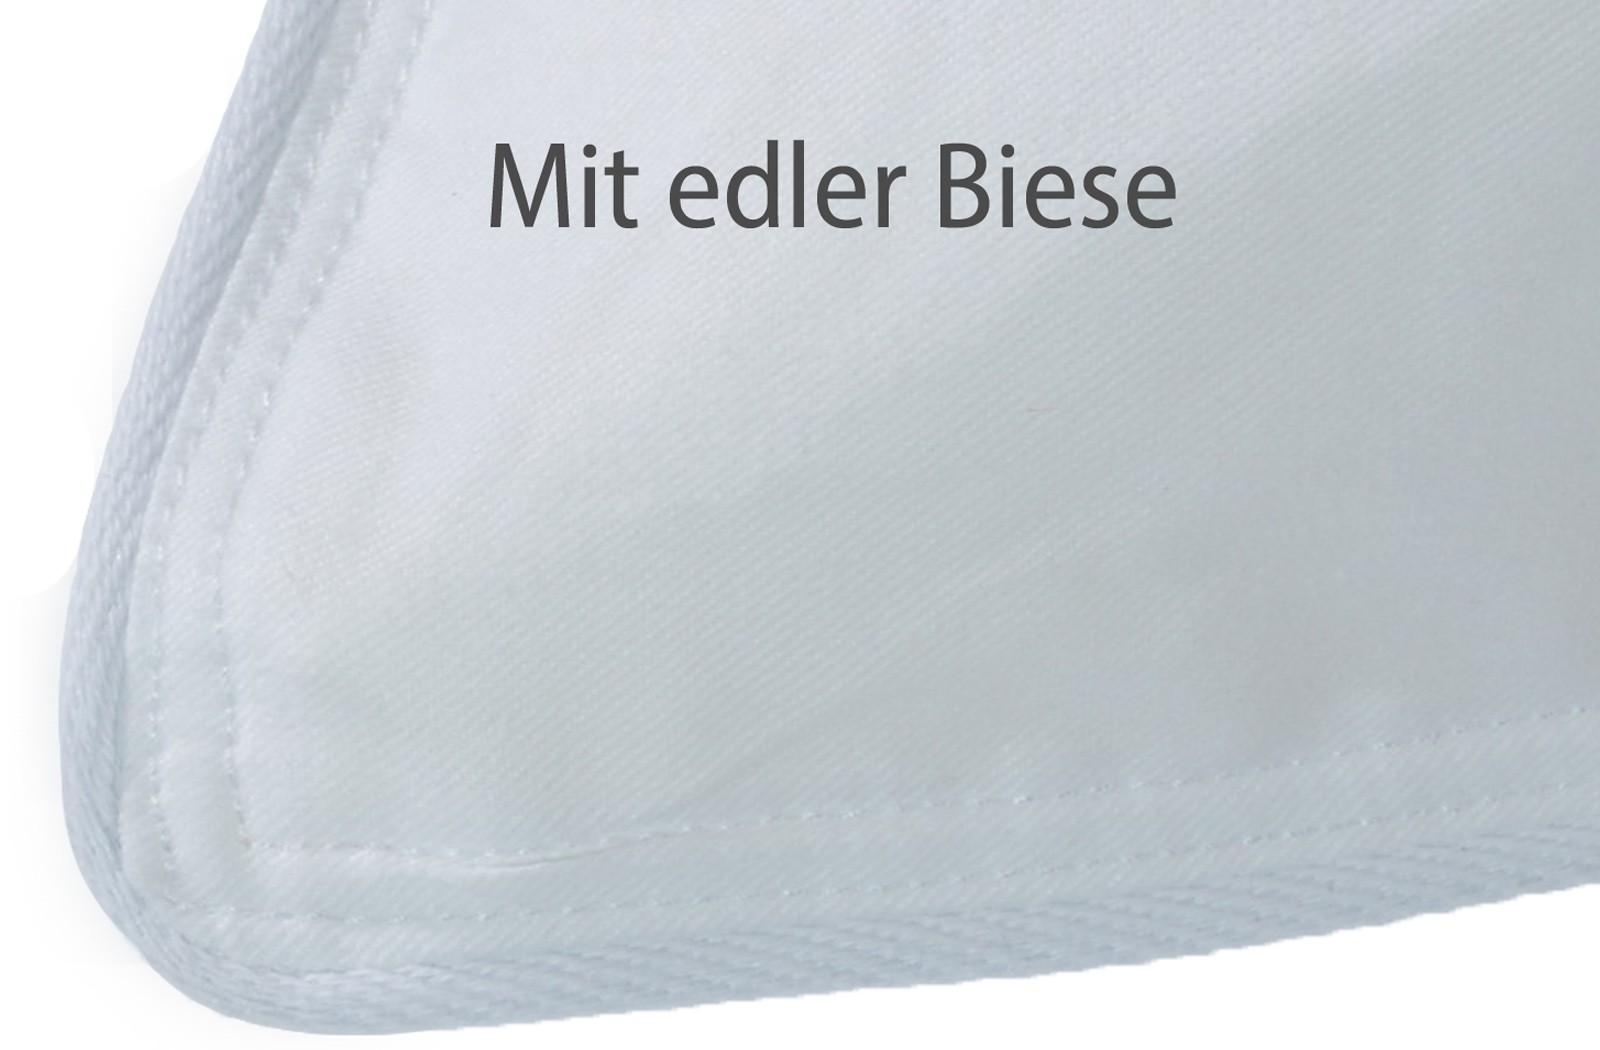 2x Kopfkissen 15% Gänse-Daunen Kissen Federn Klasse 1 80x80 Svenja – Bild 6